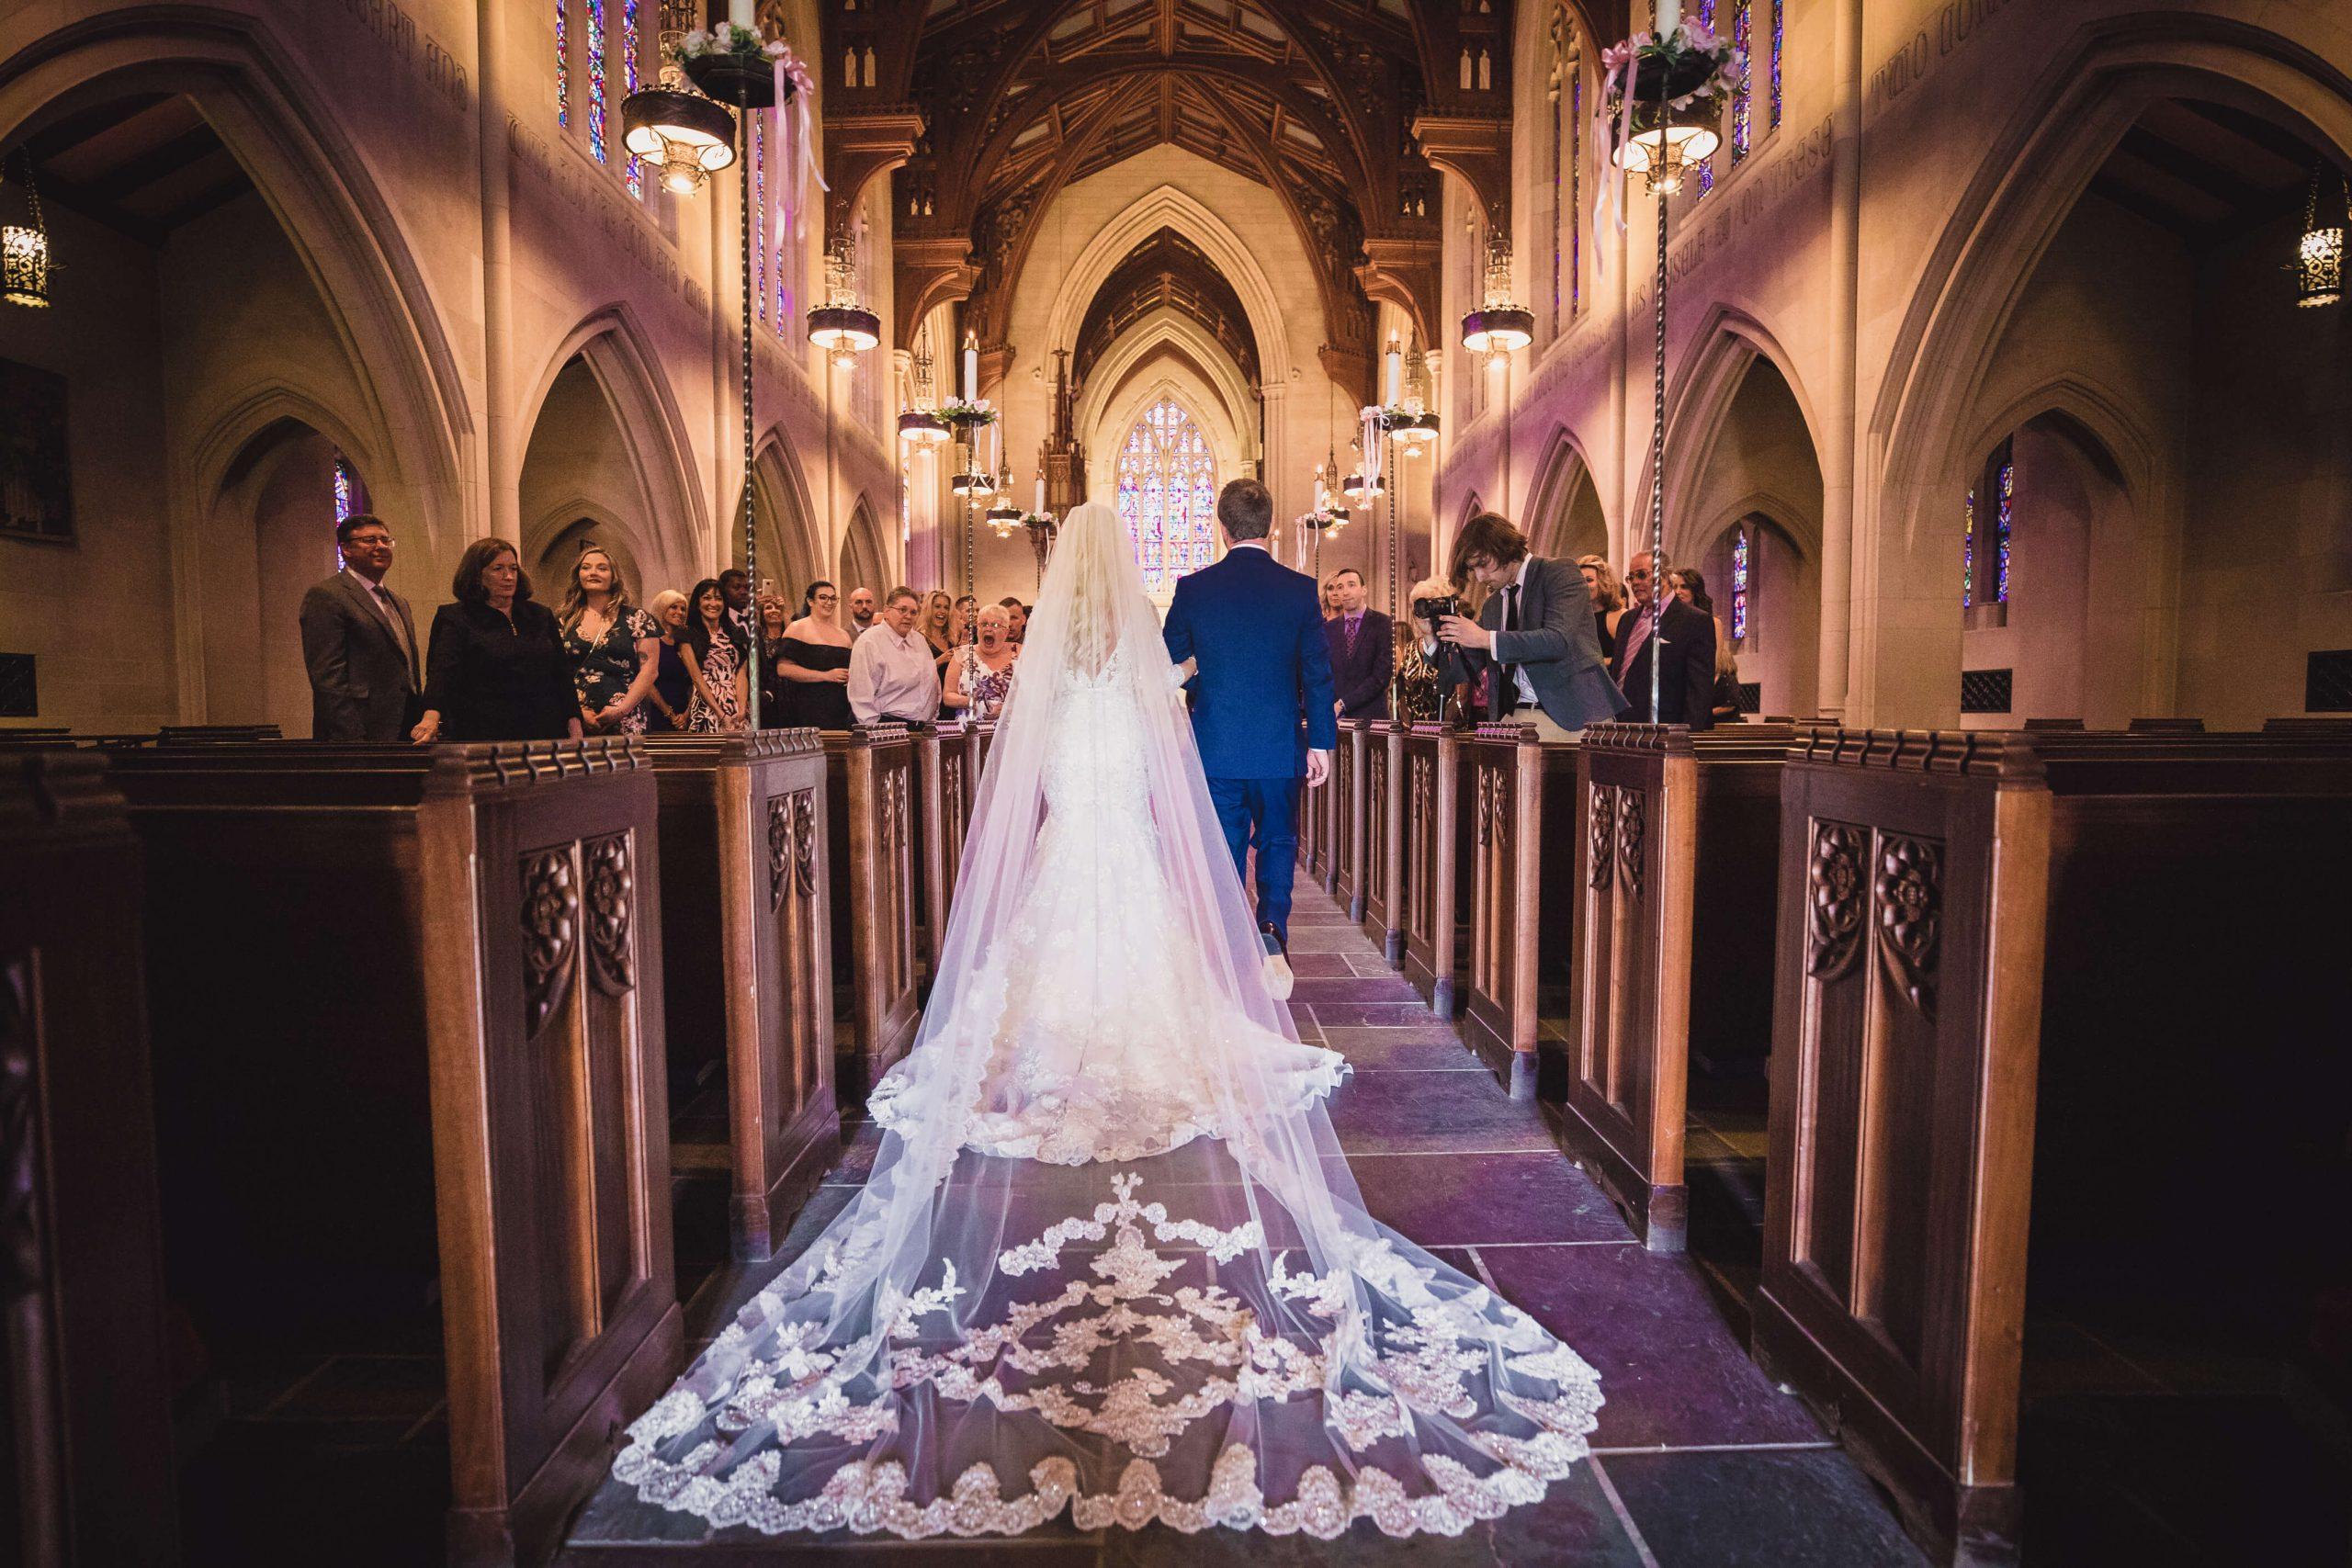 bride walking down aisle in beautiful church